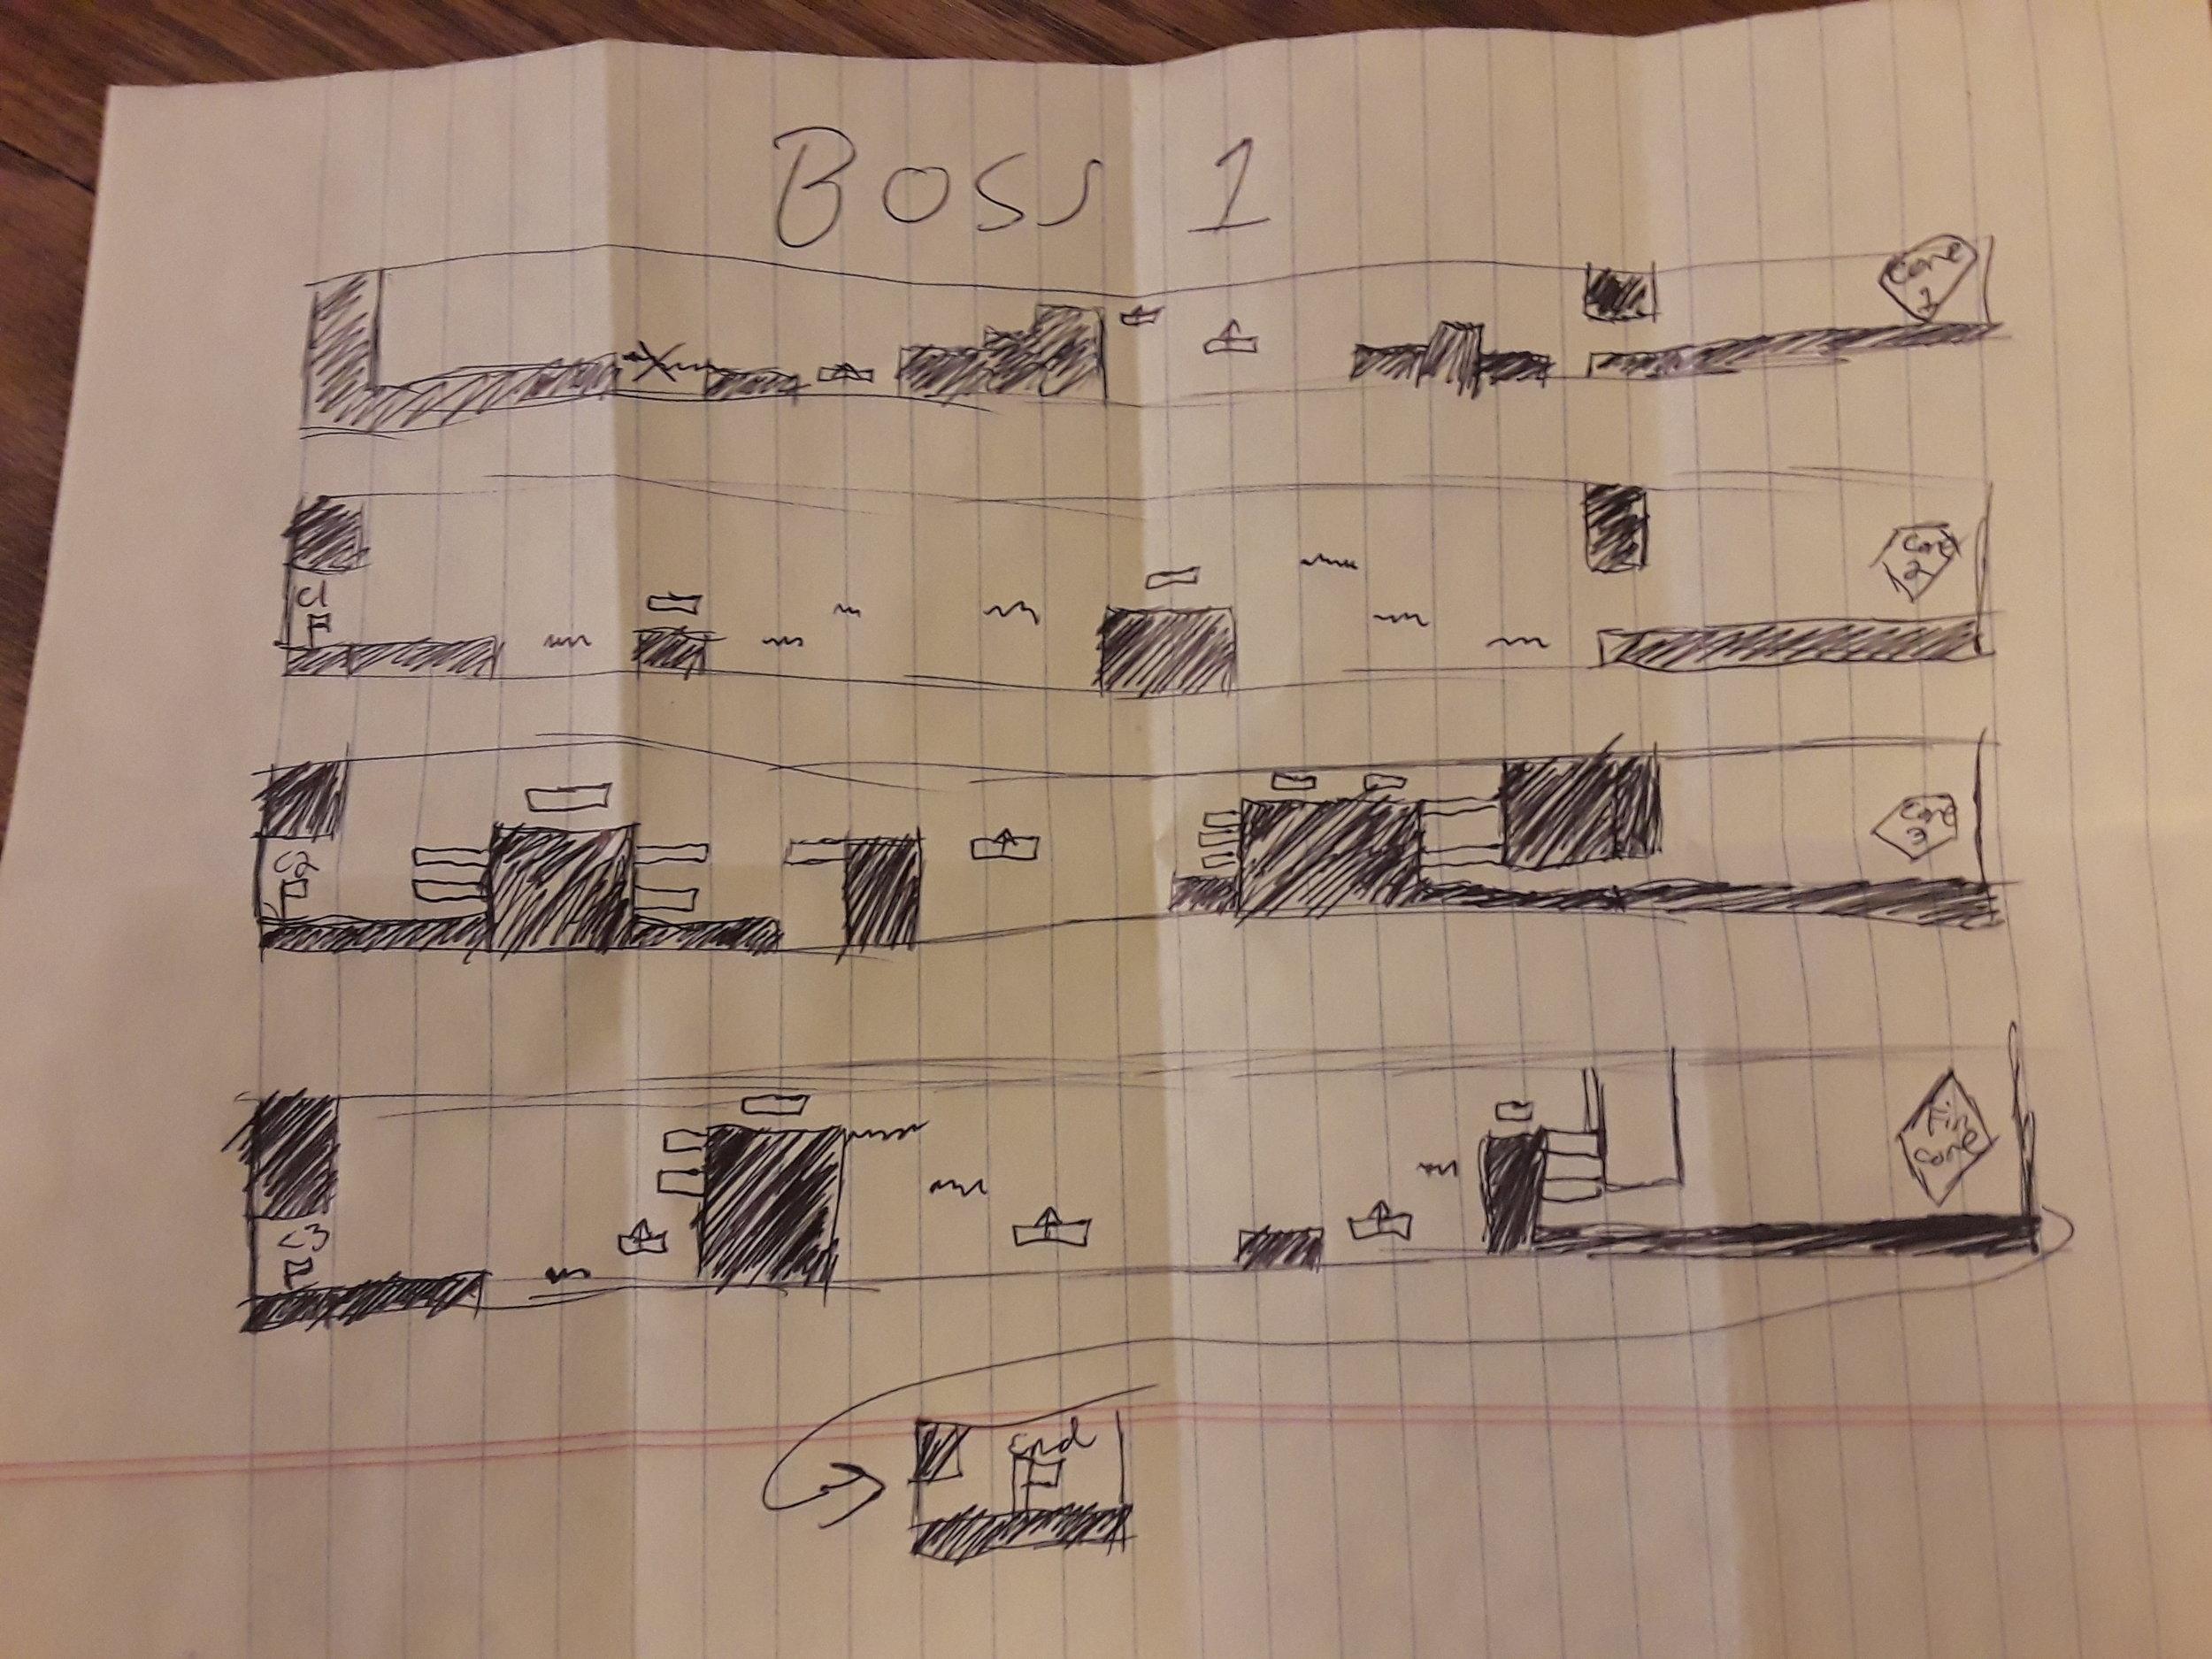 boss 1 sketch.jpg